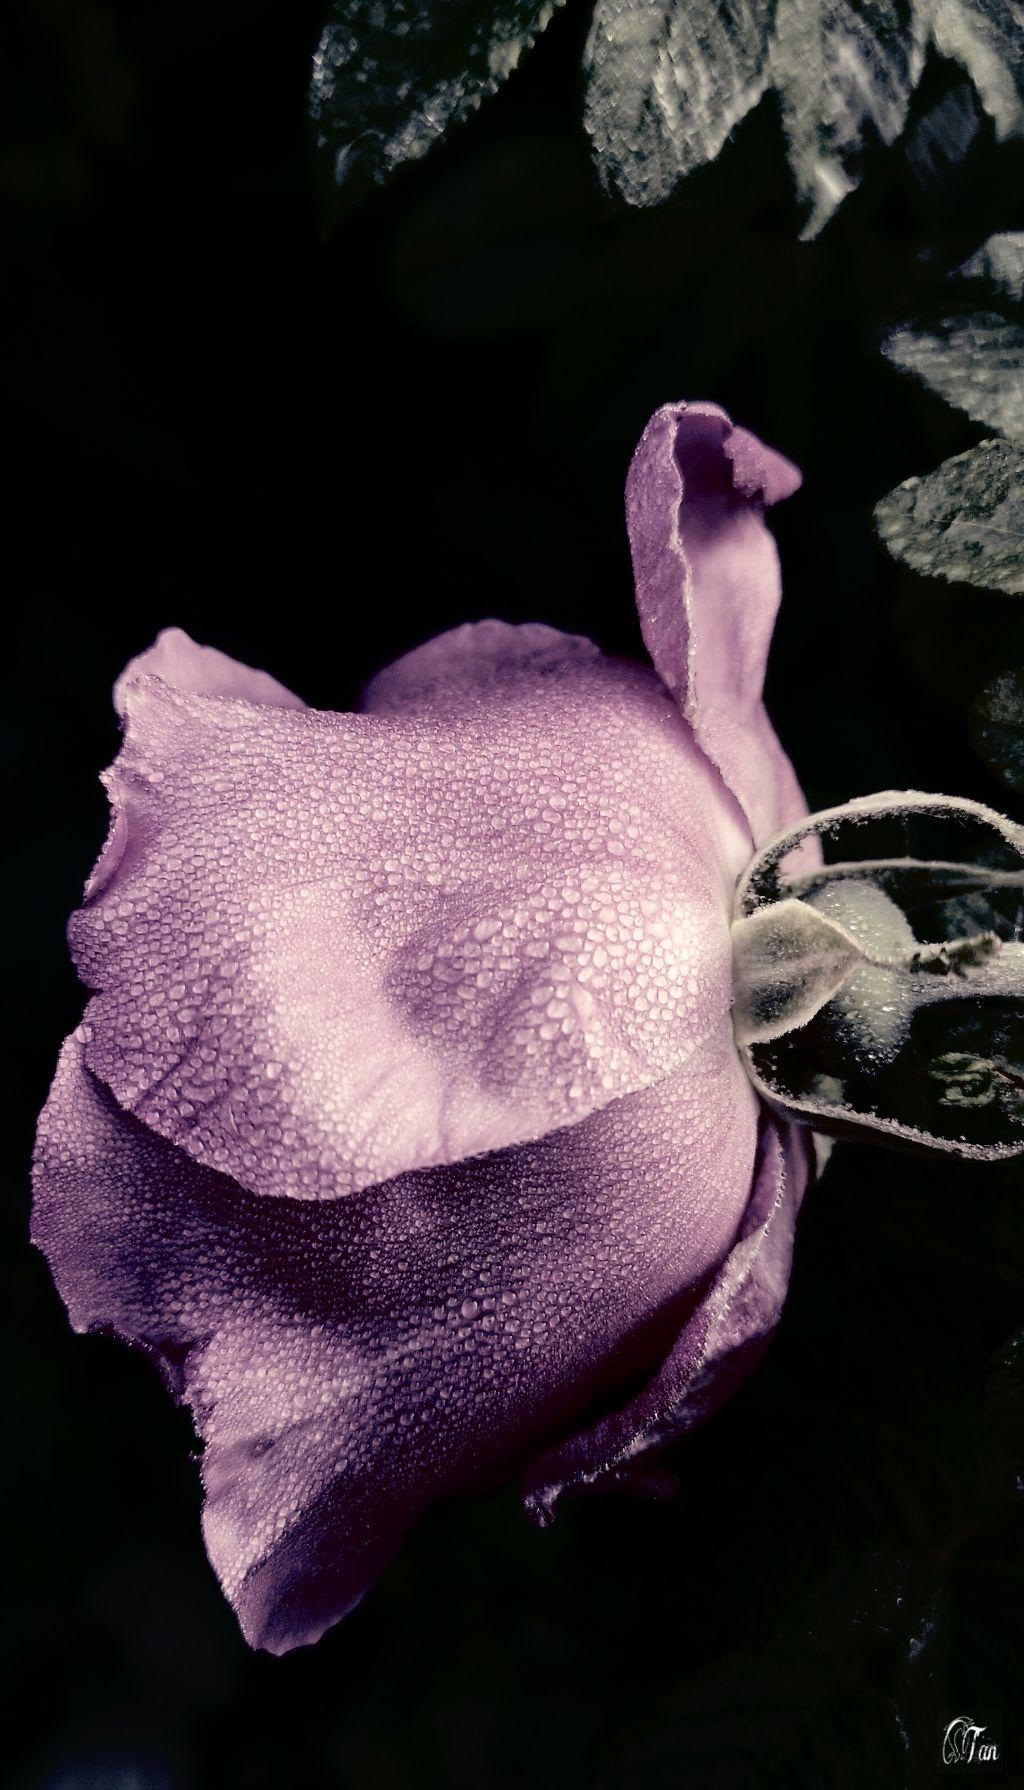 #flower #dew #contrast #nature